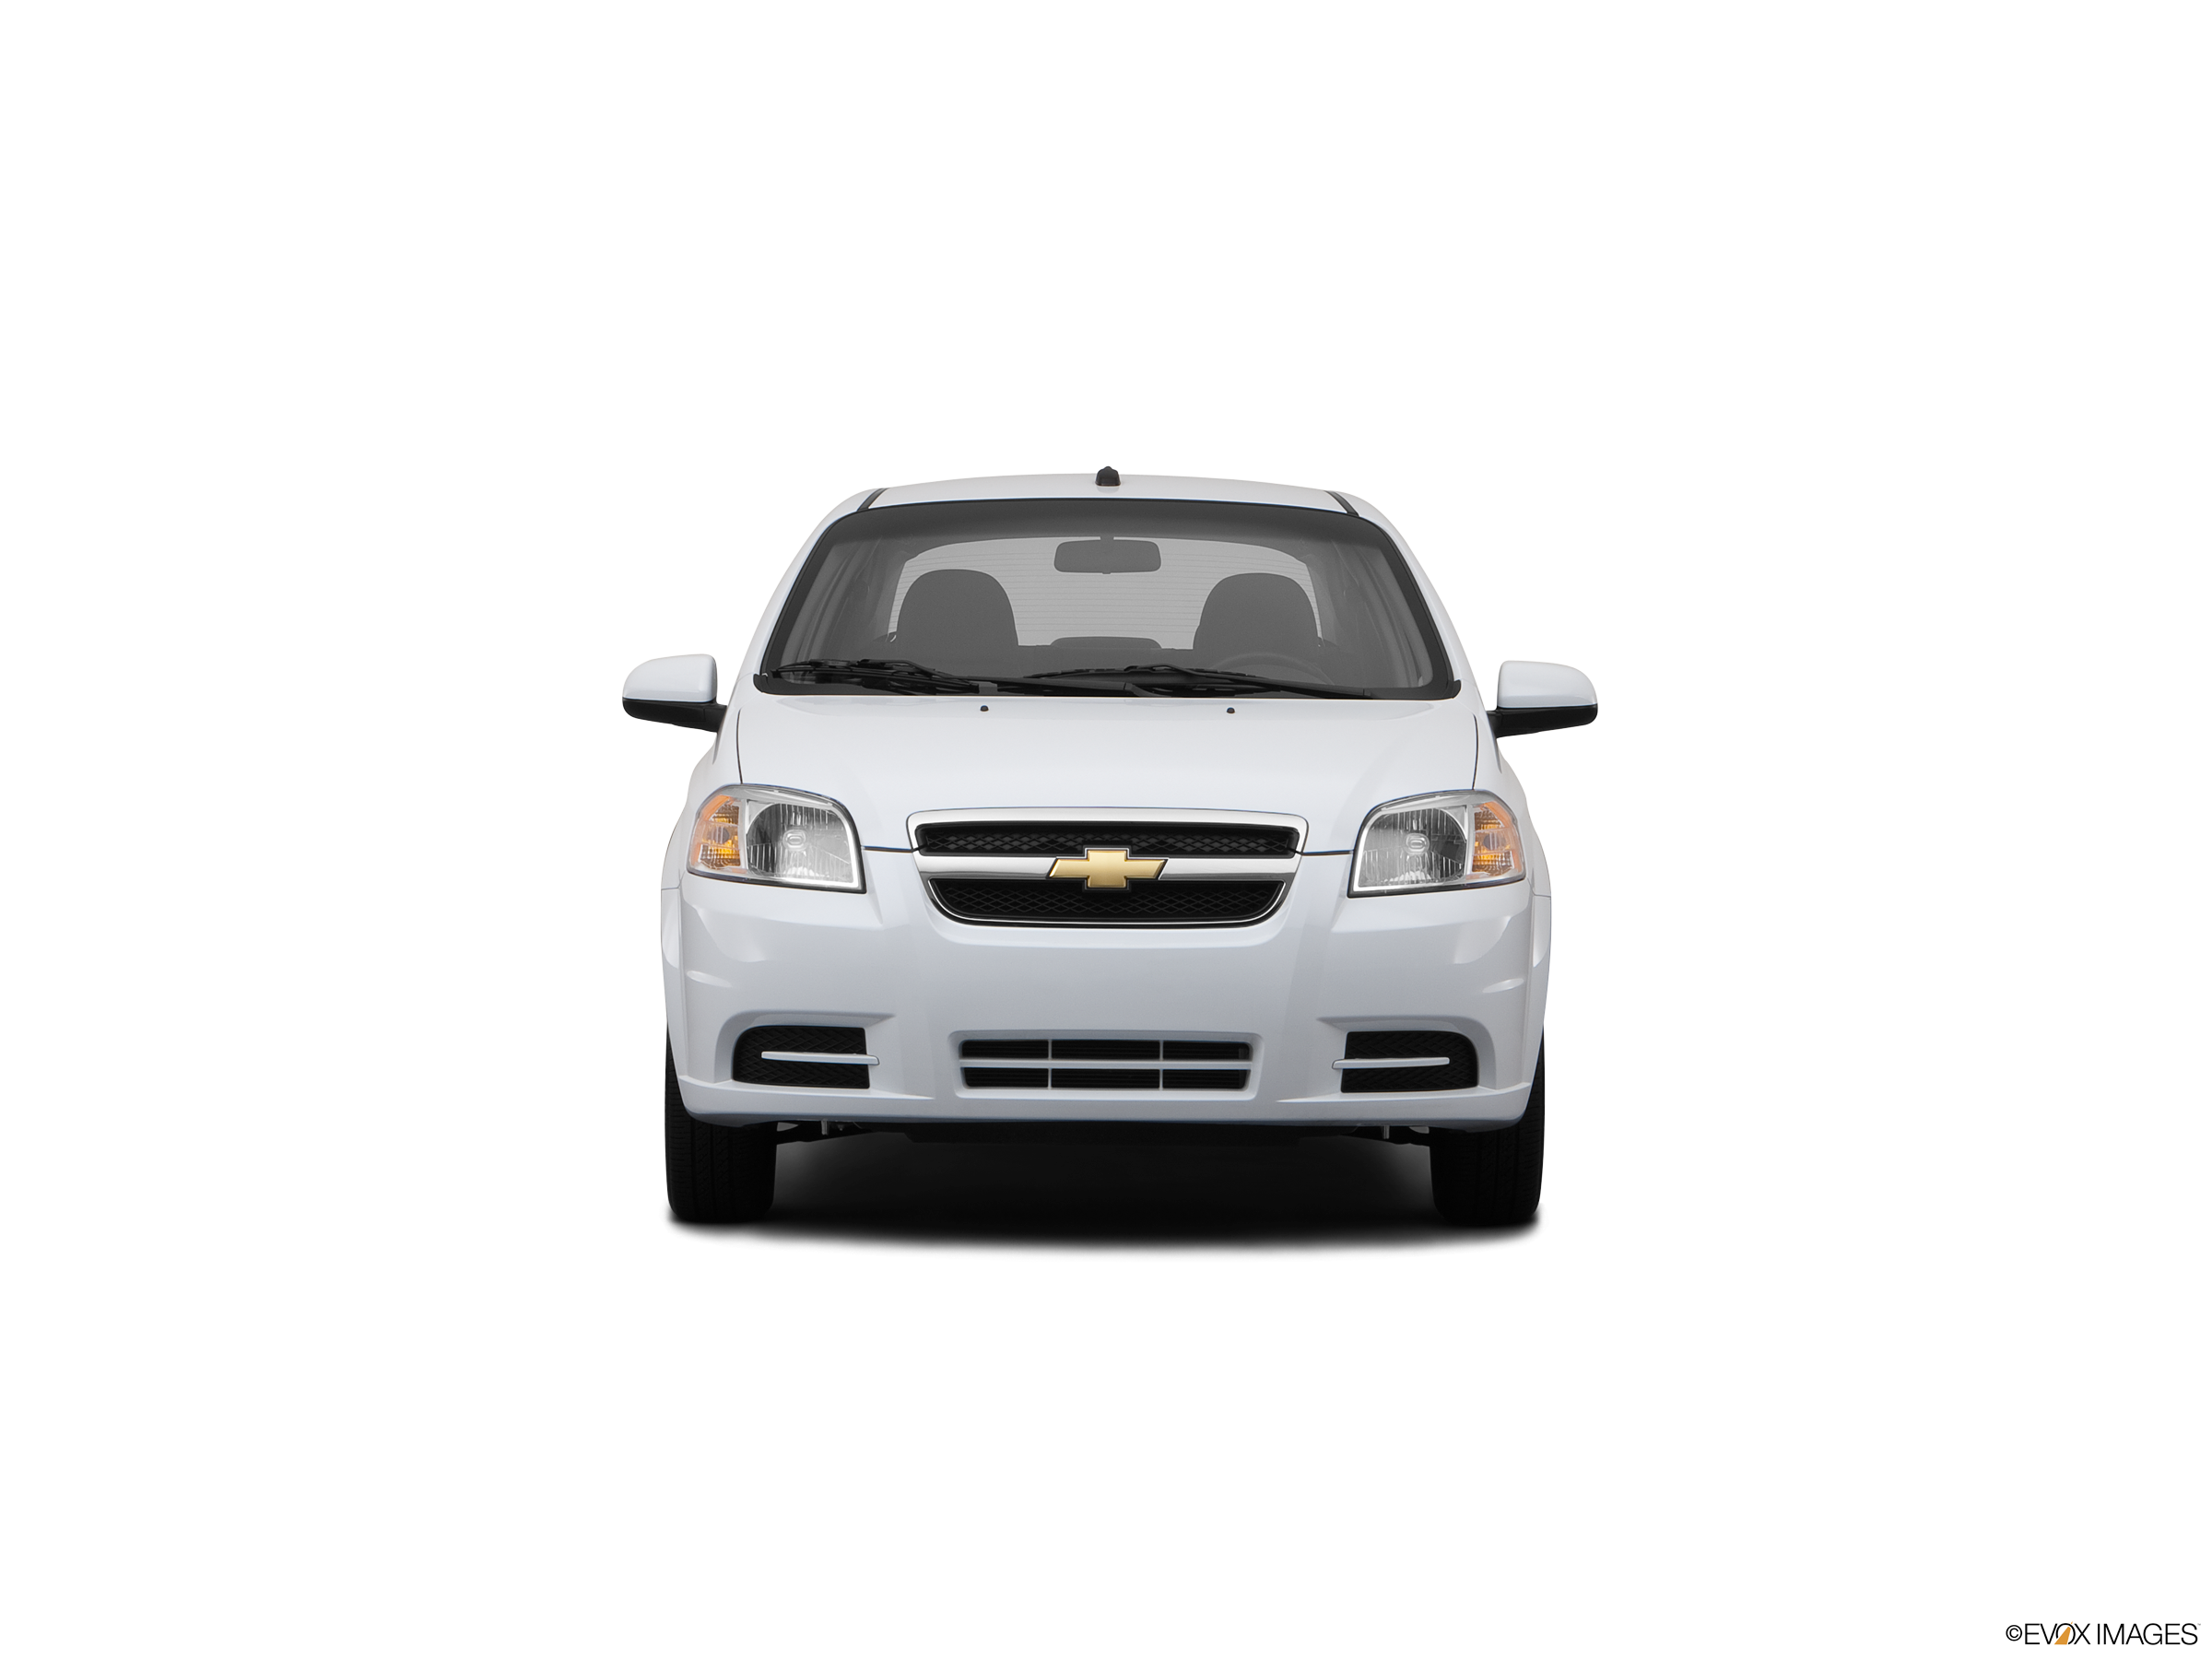 Used 2011 Chevrolet Aveo Ls Sedan 4d Prices Kelley Blue Book